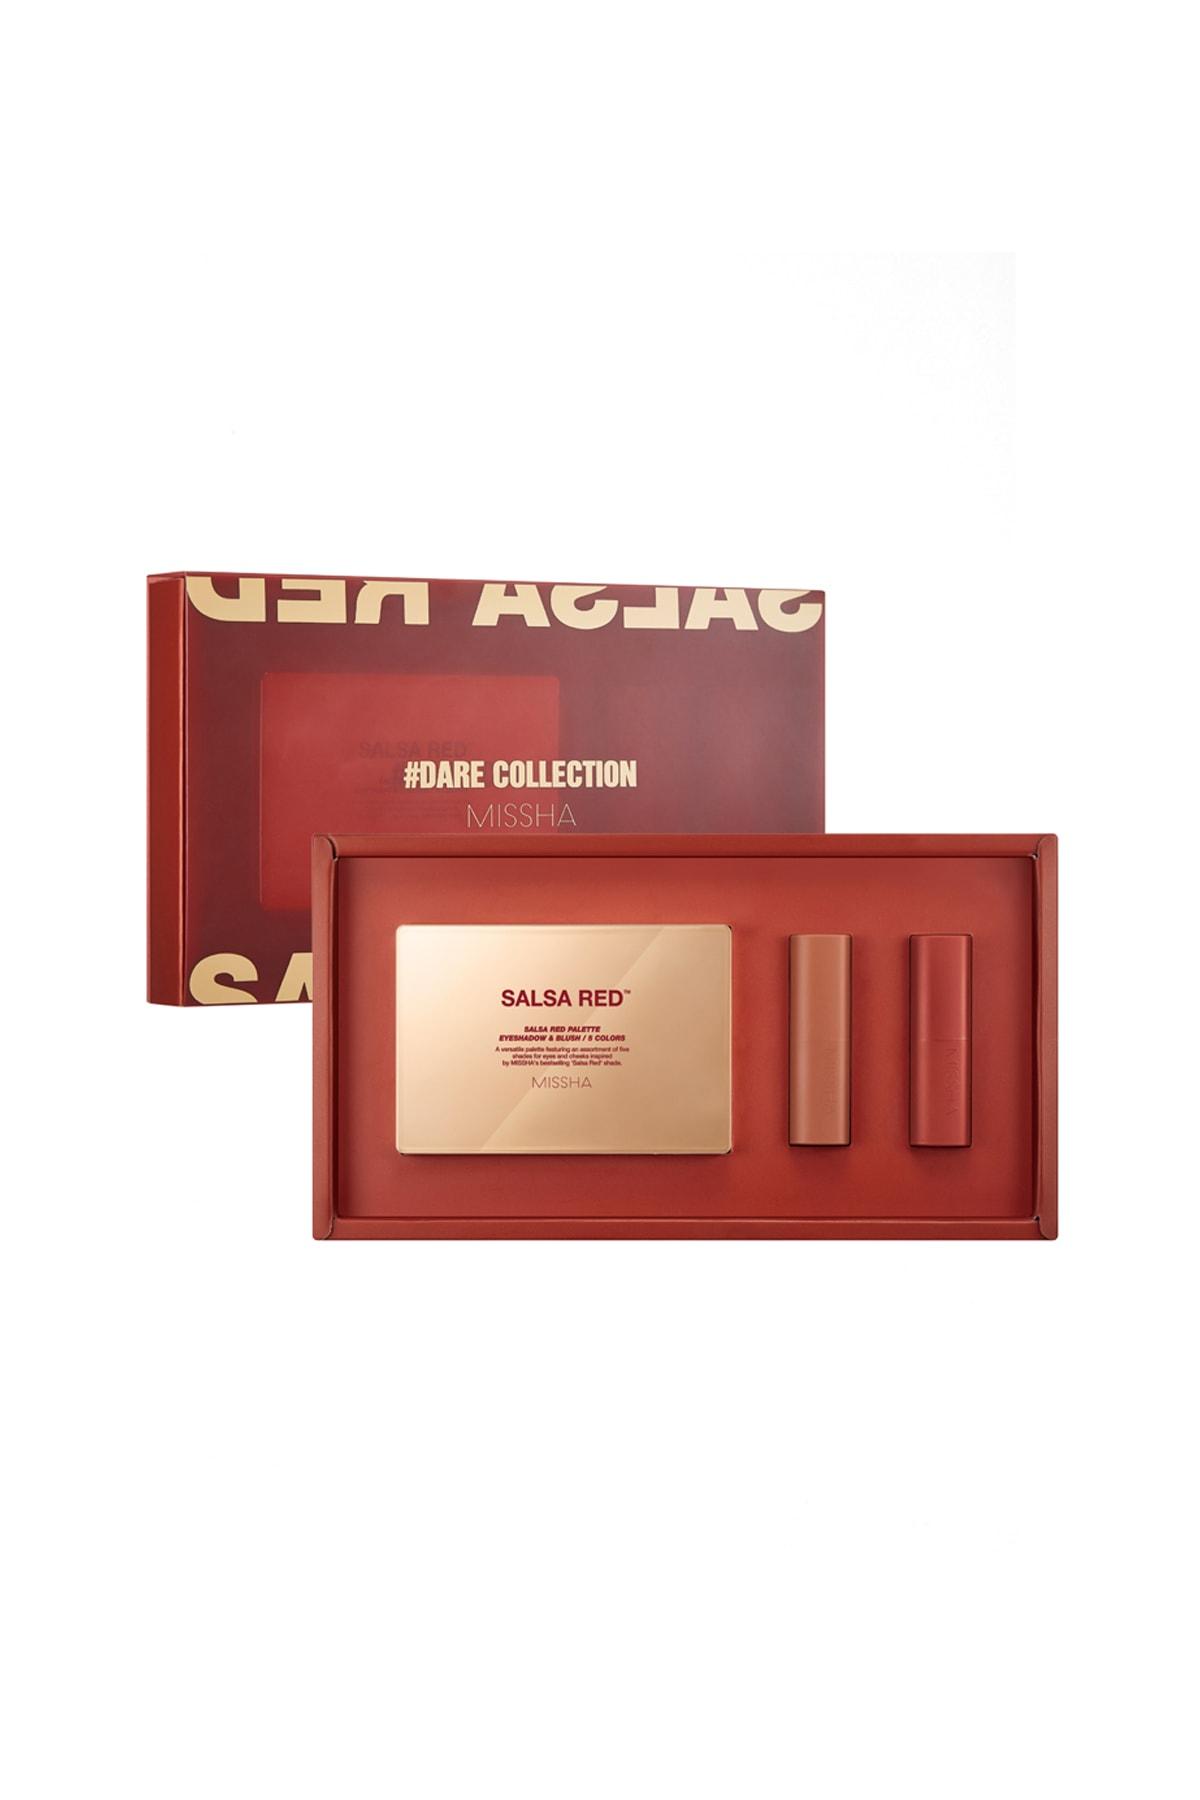 Missha Far & Allık & Ruj Özel Set Dare Collection (Salsa Red)